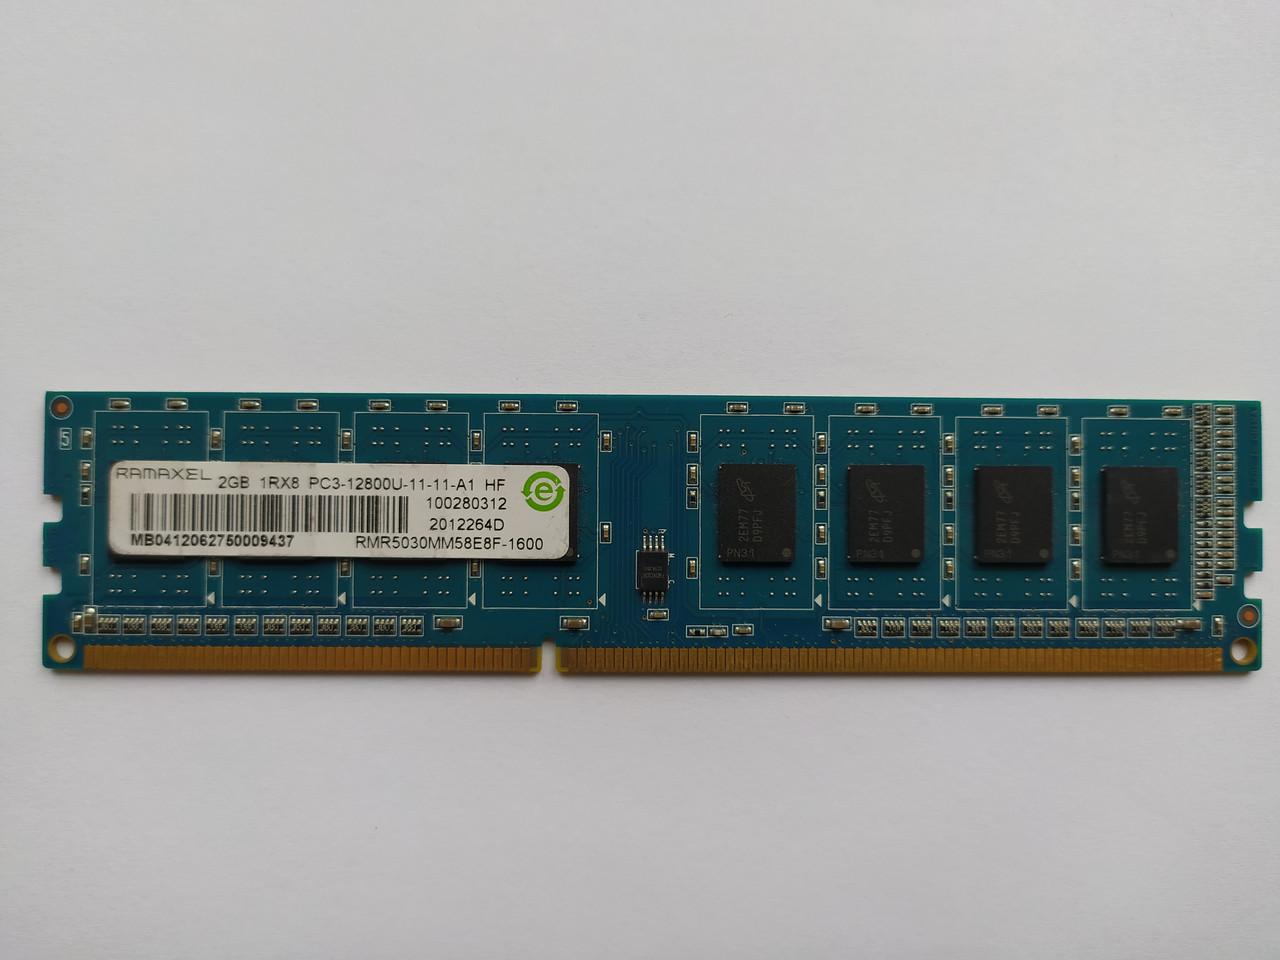 Оперативная память Ramaxel DDR3 2Gb 1600MHz PC3-12800U (RMR5030MM58E8F-1600) Б/У